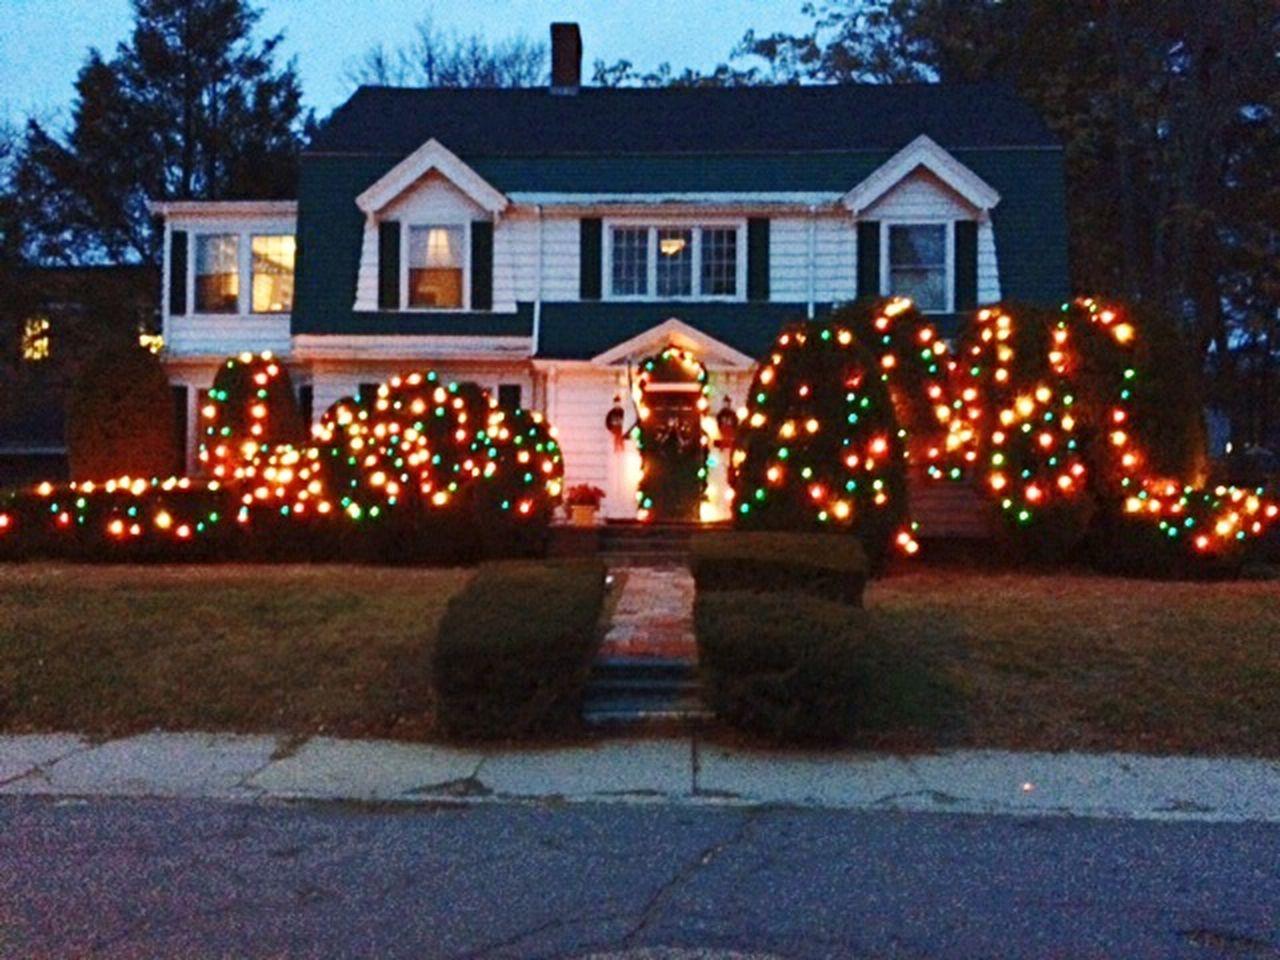 celebration, illuminated, night, building exterior, outdoors, christmas, no people, tree, architecture, multi colored, sky